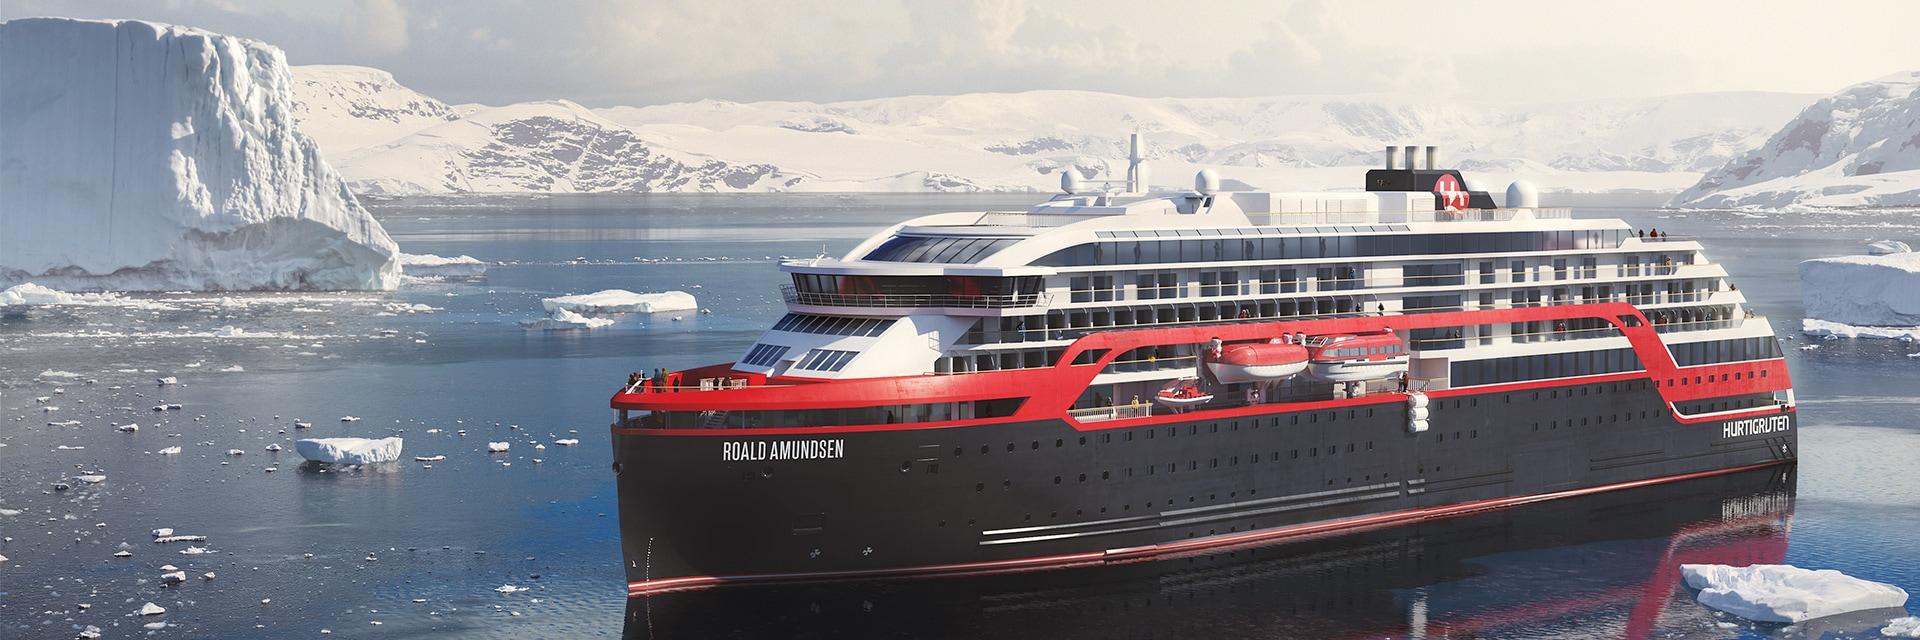 Masthead-MS-Roald-Amundsen